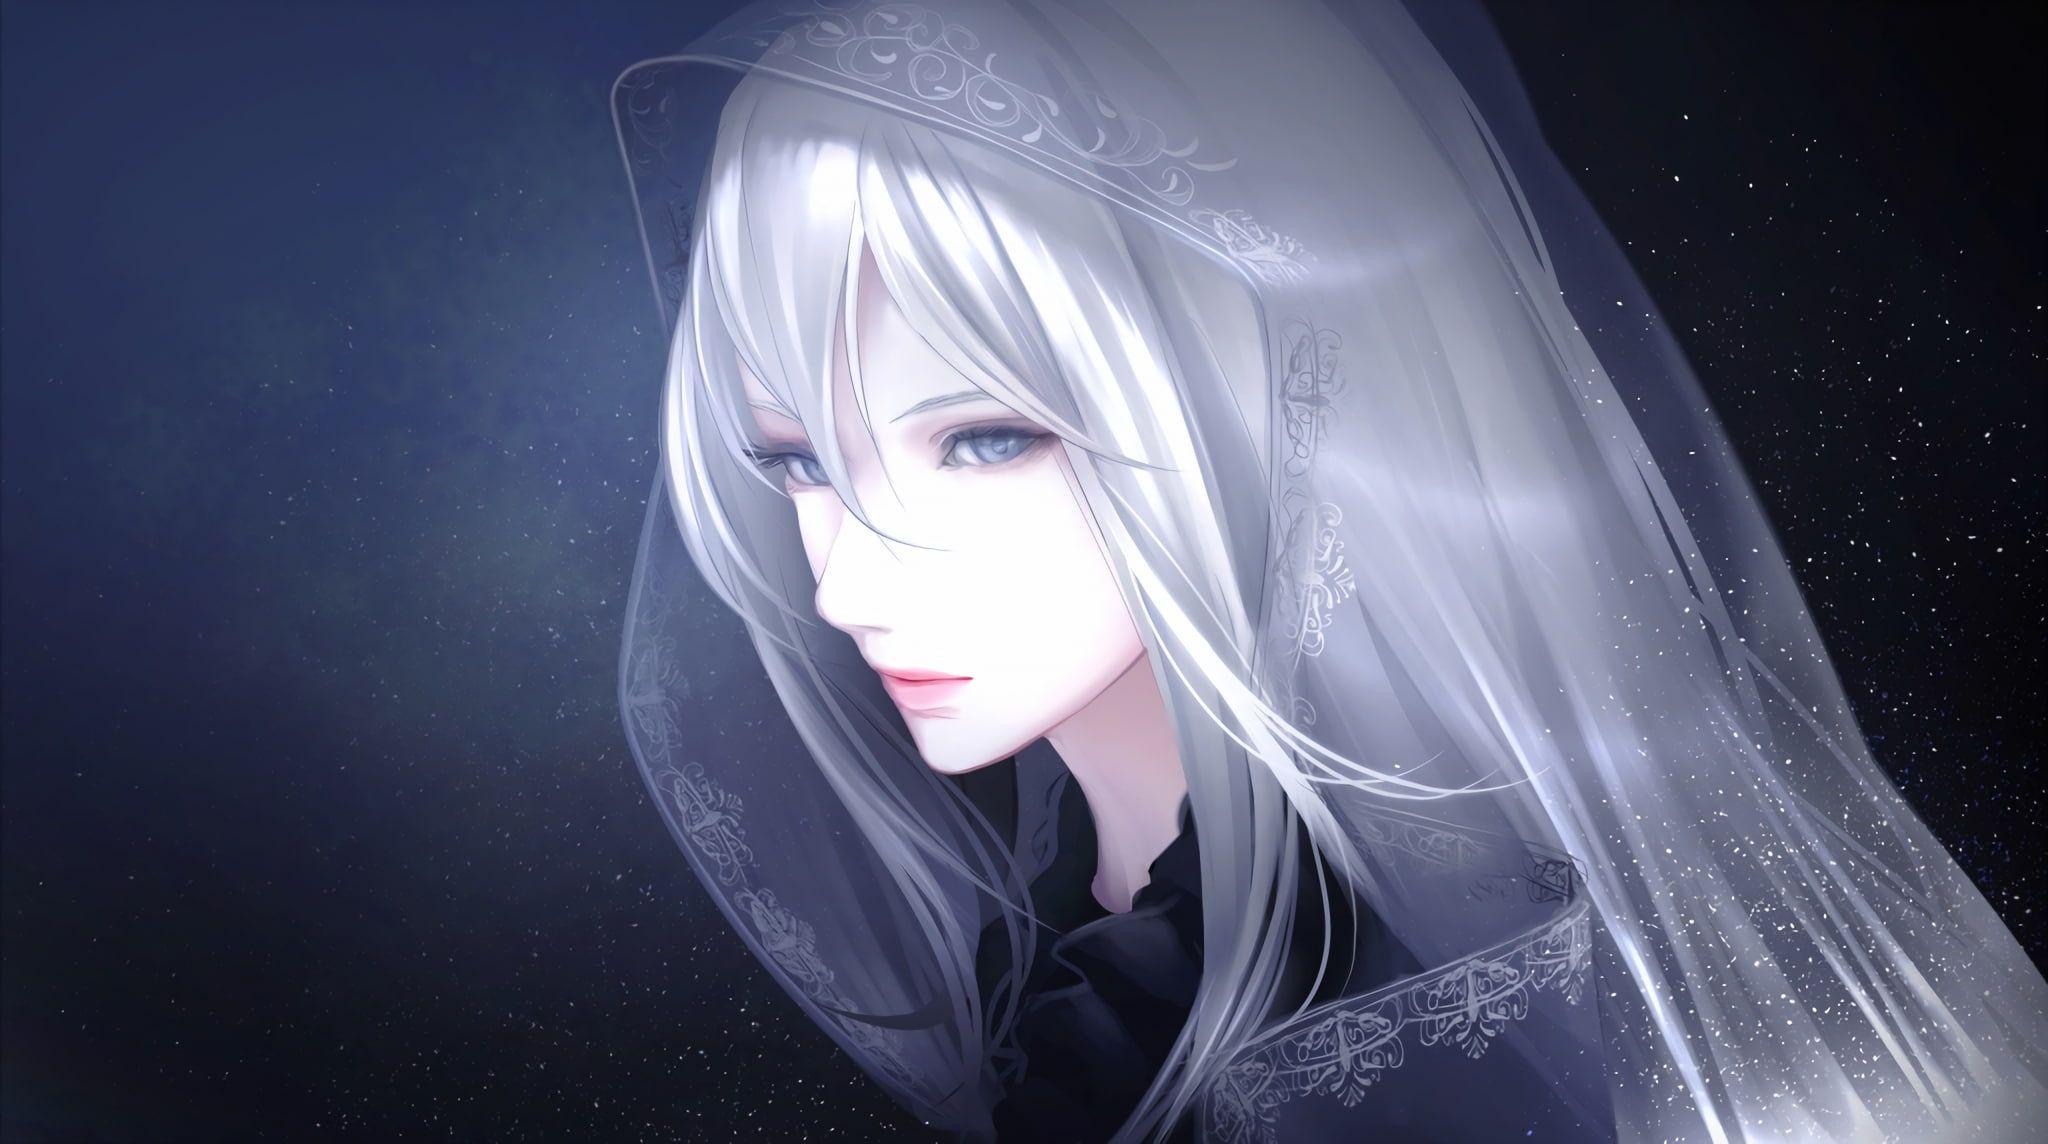 anime anime girls long hair white hair blue eyes 1080P